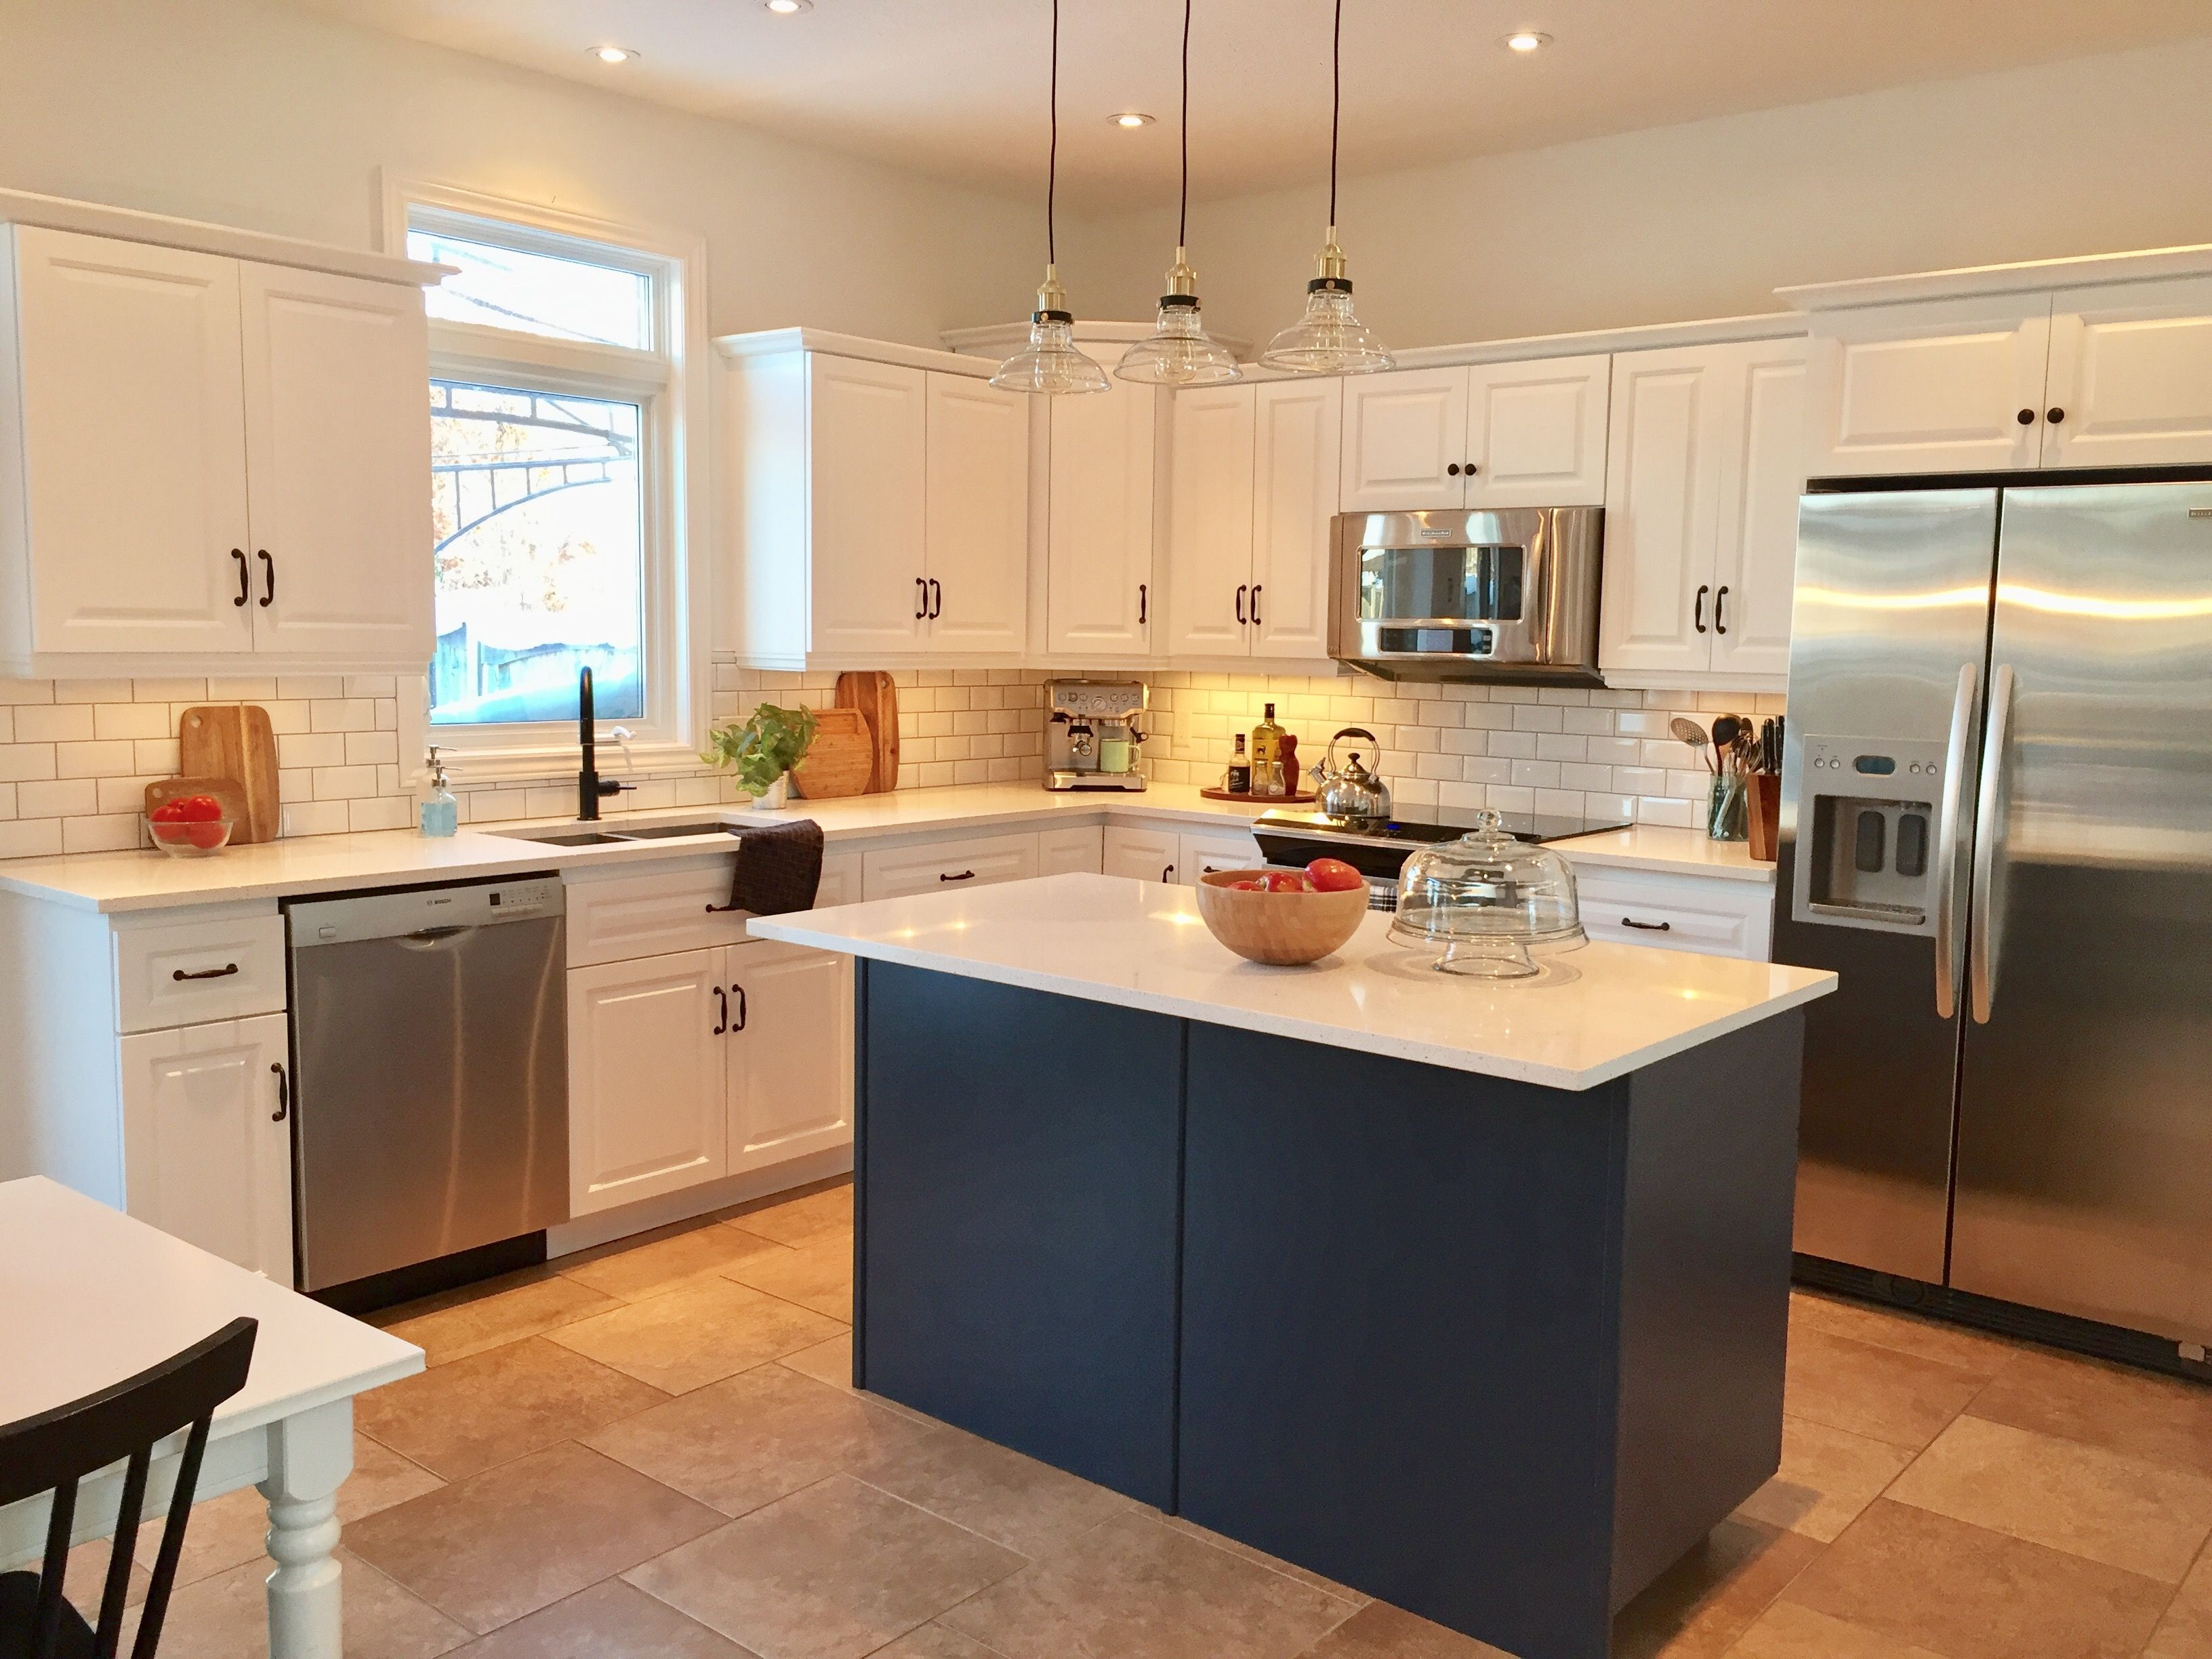 Hale Navy Island Quartz Counters Chantilly Lace Cabinets Kitchen Redo Kitchen Design Navy Kitchen Cabinets